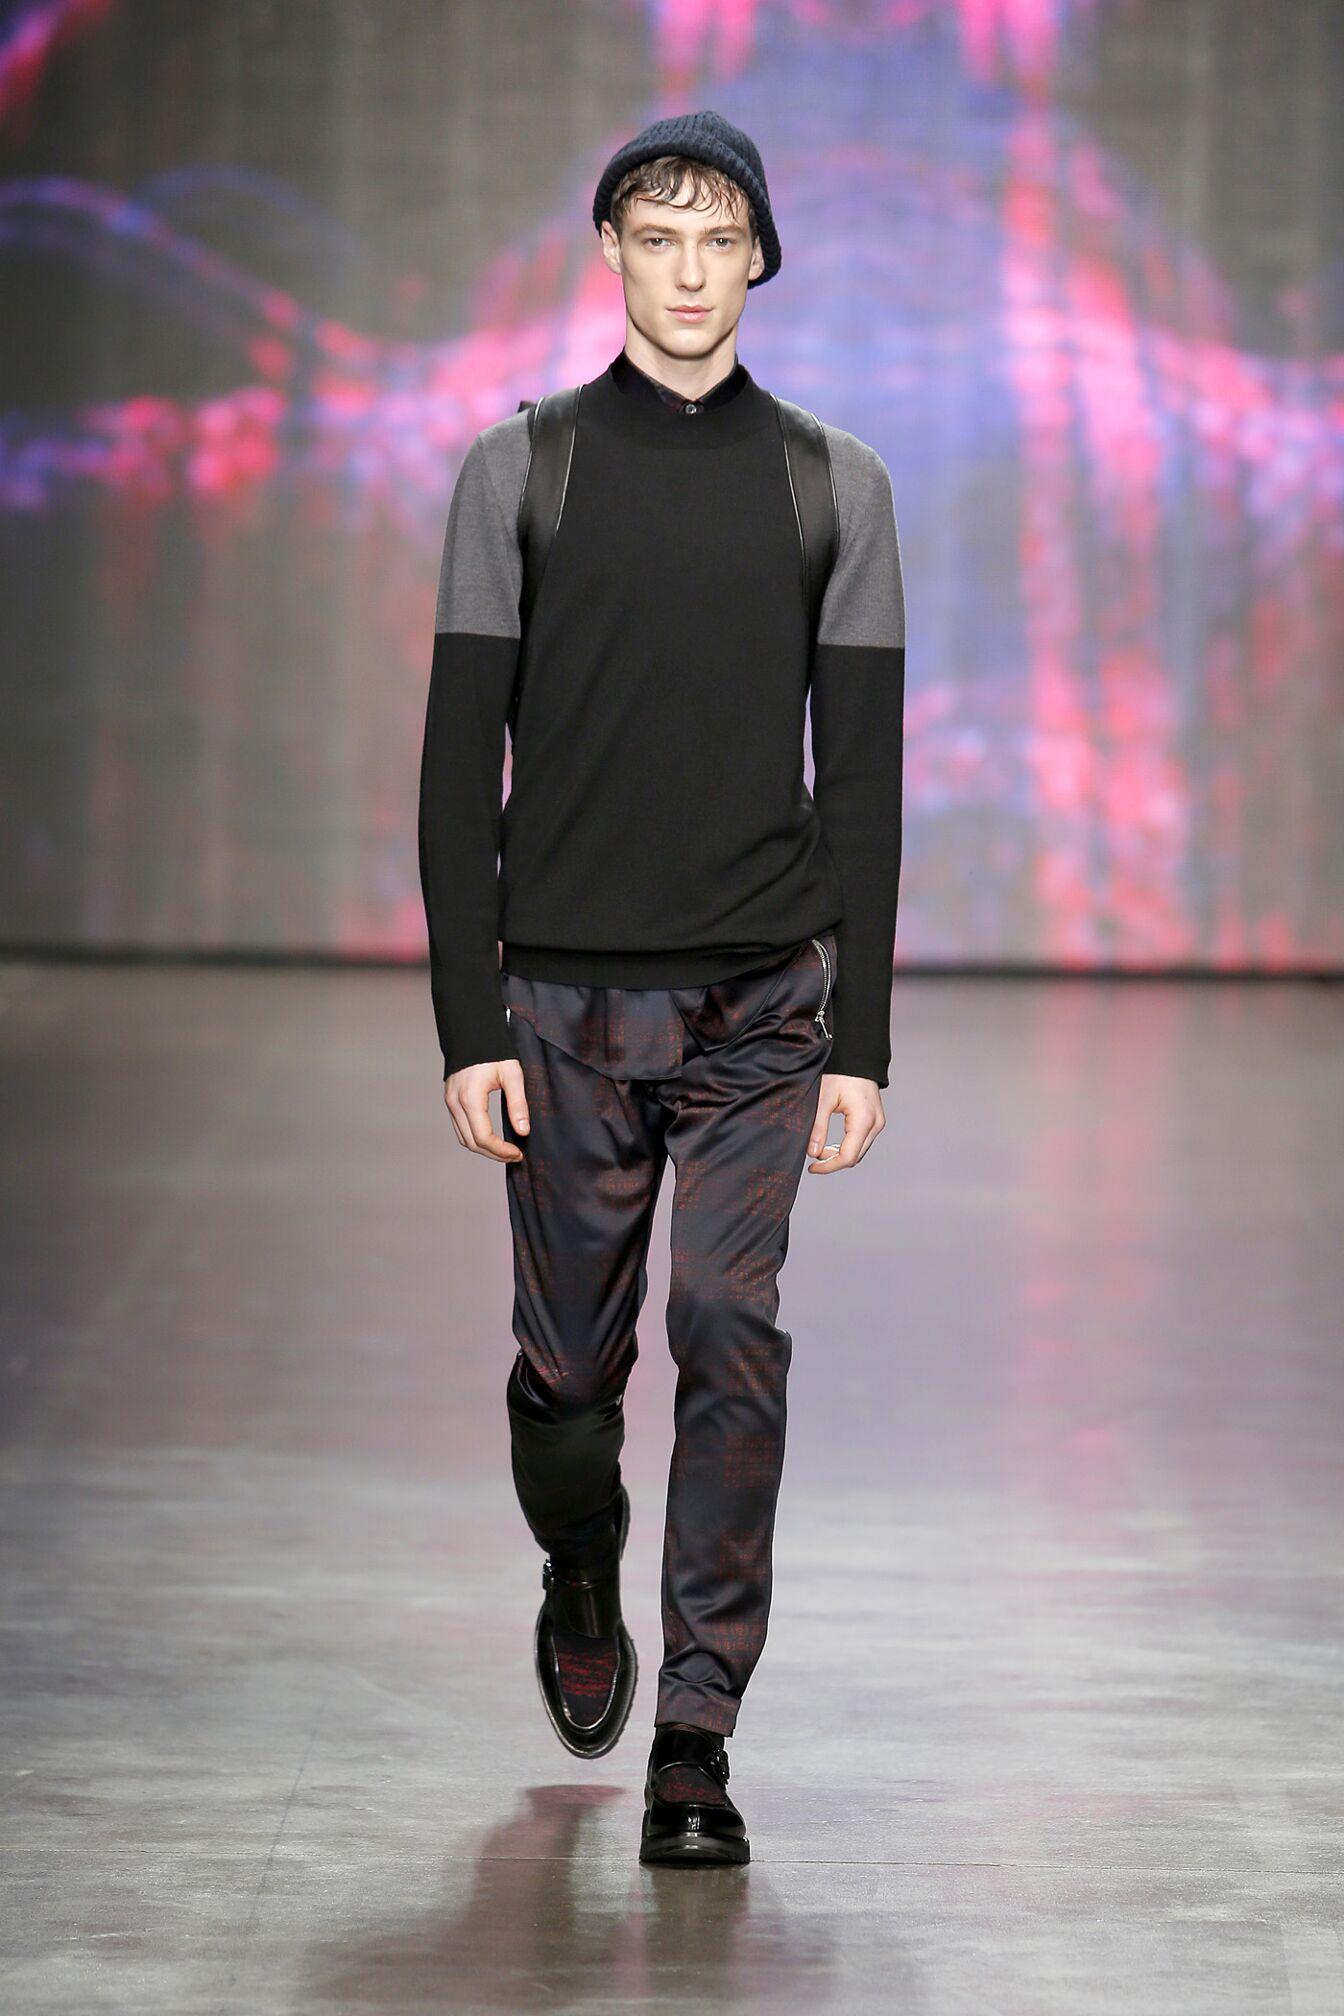 Fall Winter 2014 15 Fashion Men's Collection Iceberg